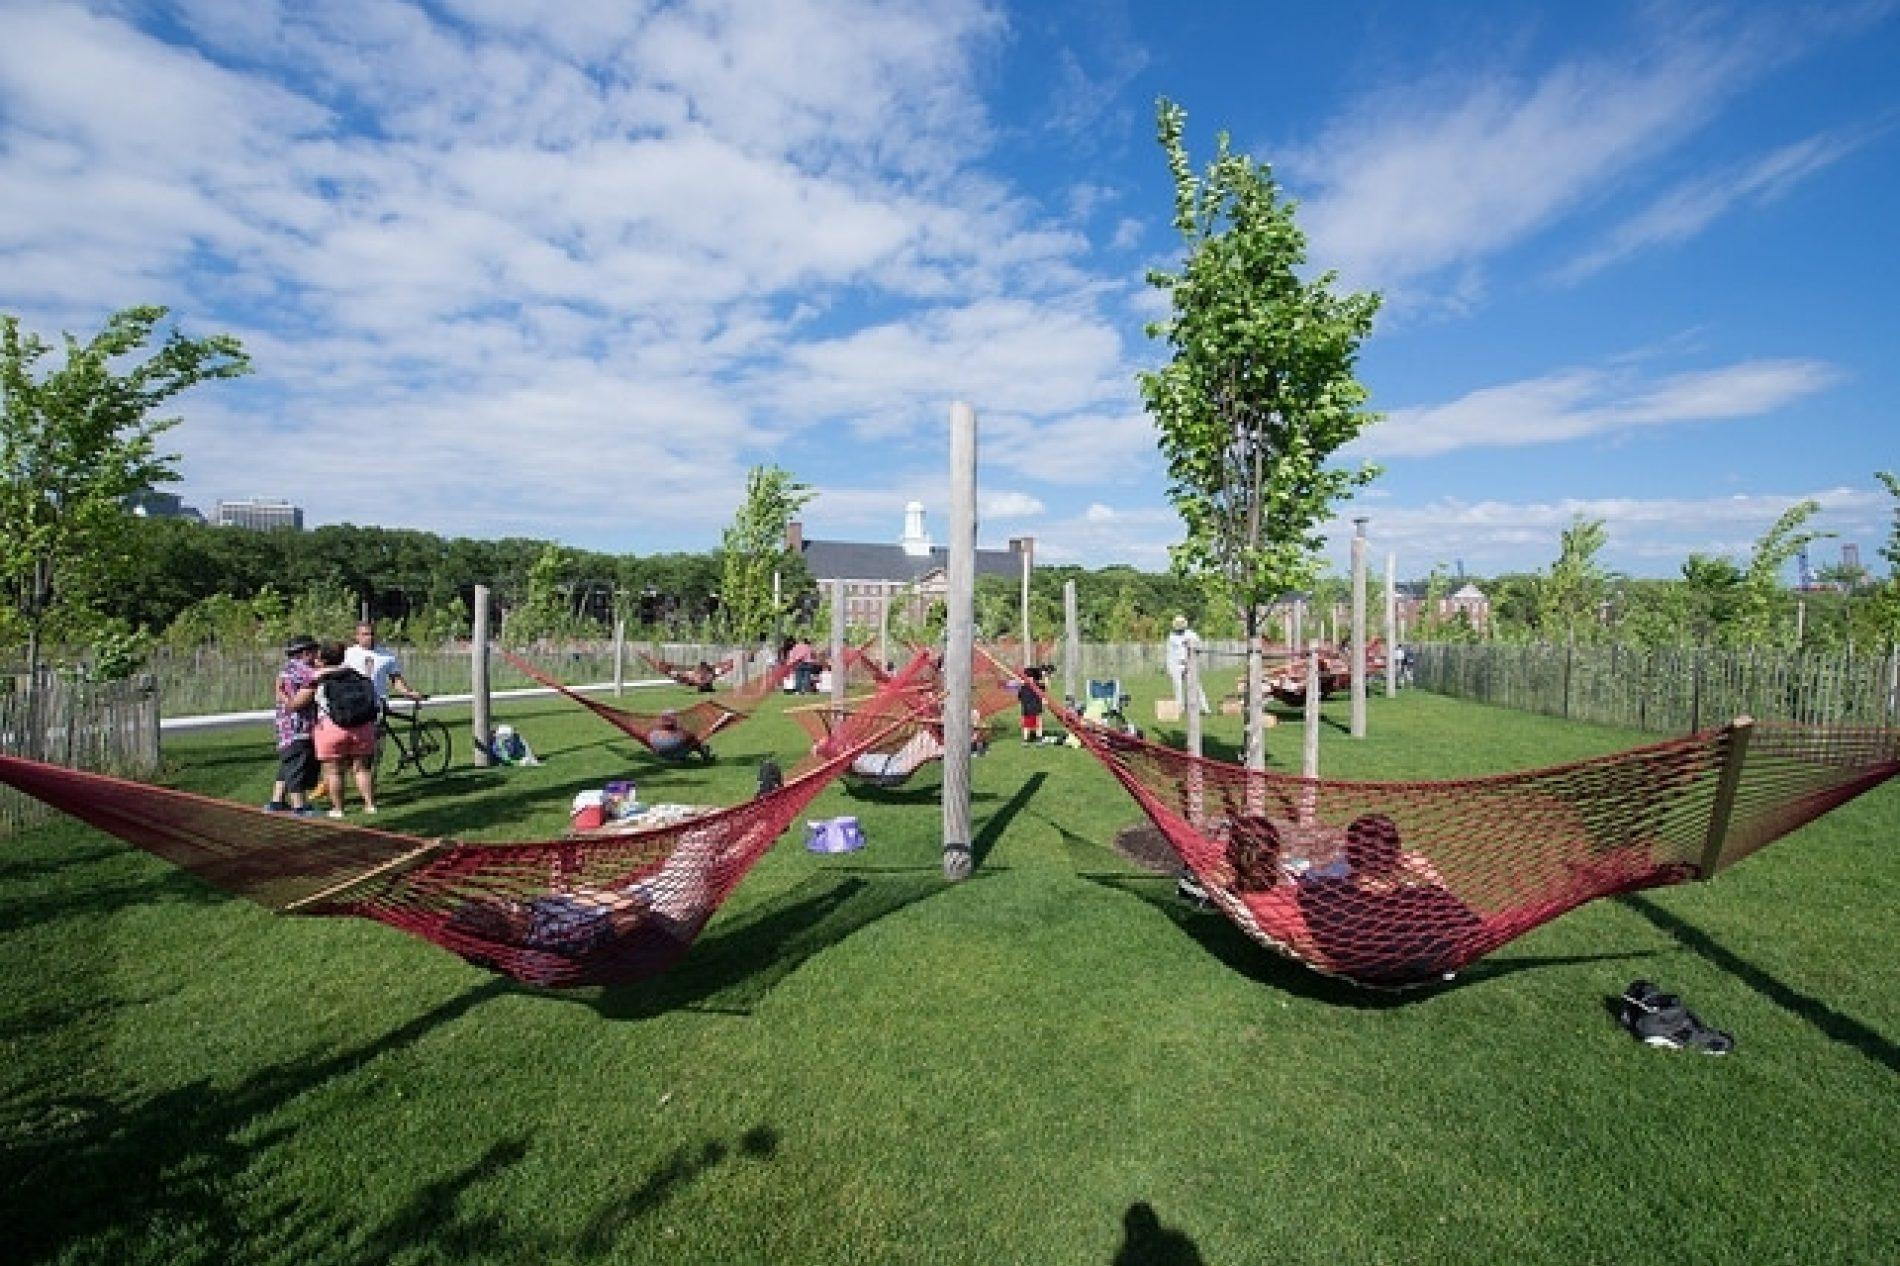 50 hammocks in a grove   just for hammocks